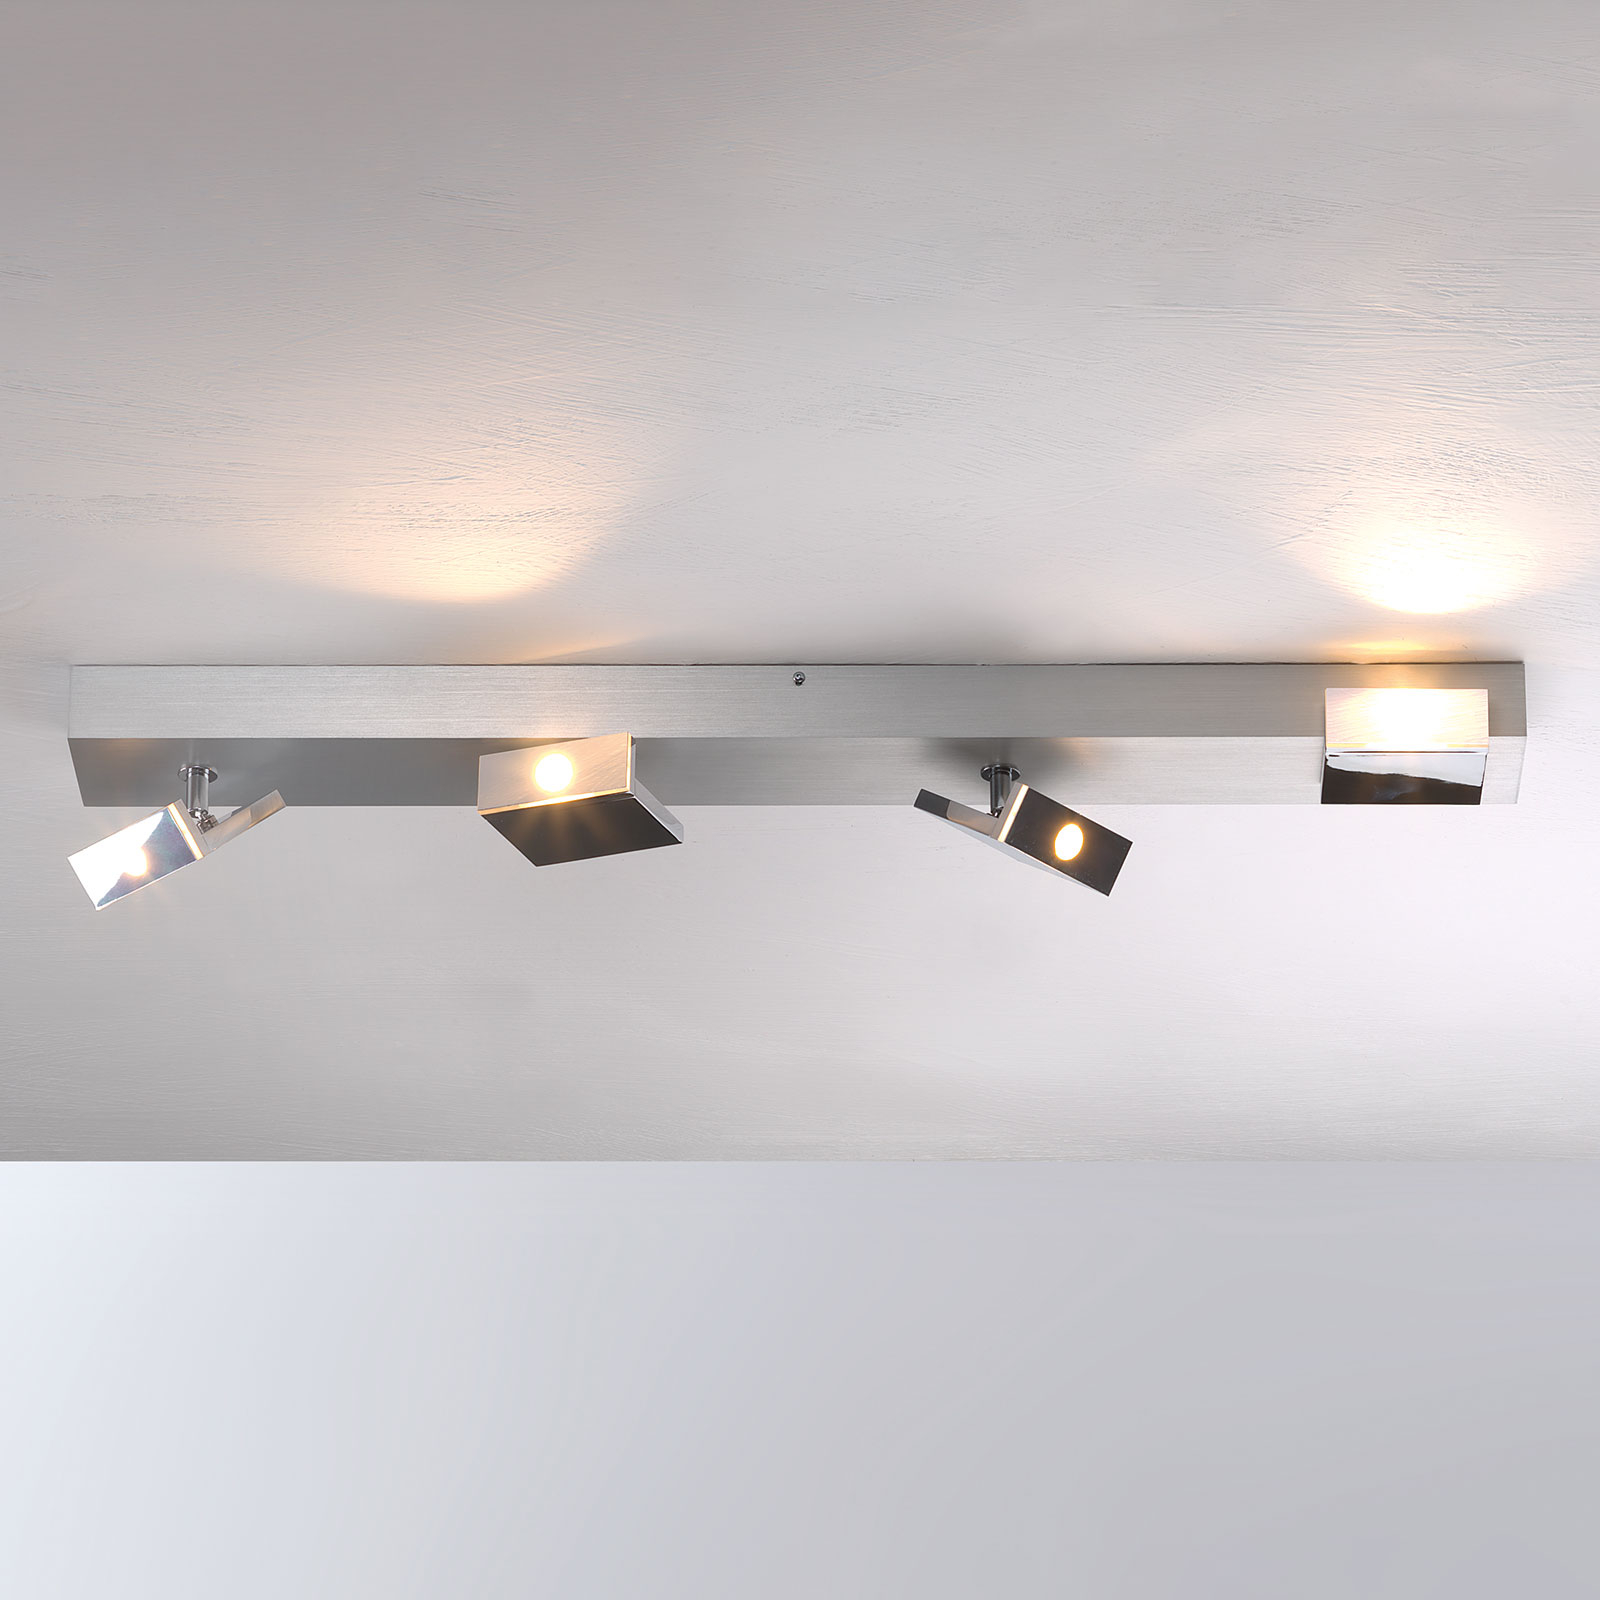 Elle - four-bulb LED spotlight w/ charm, dimmable_1556130_1